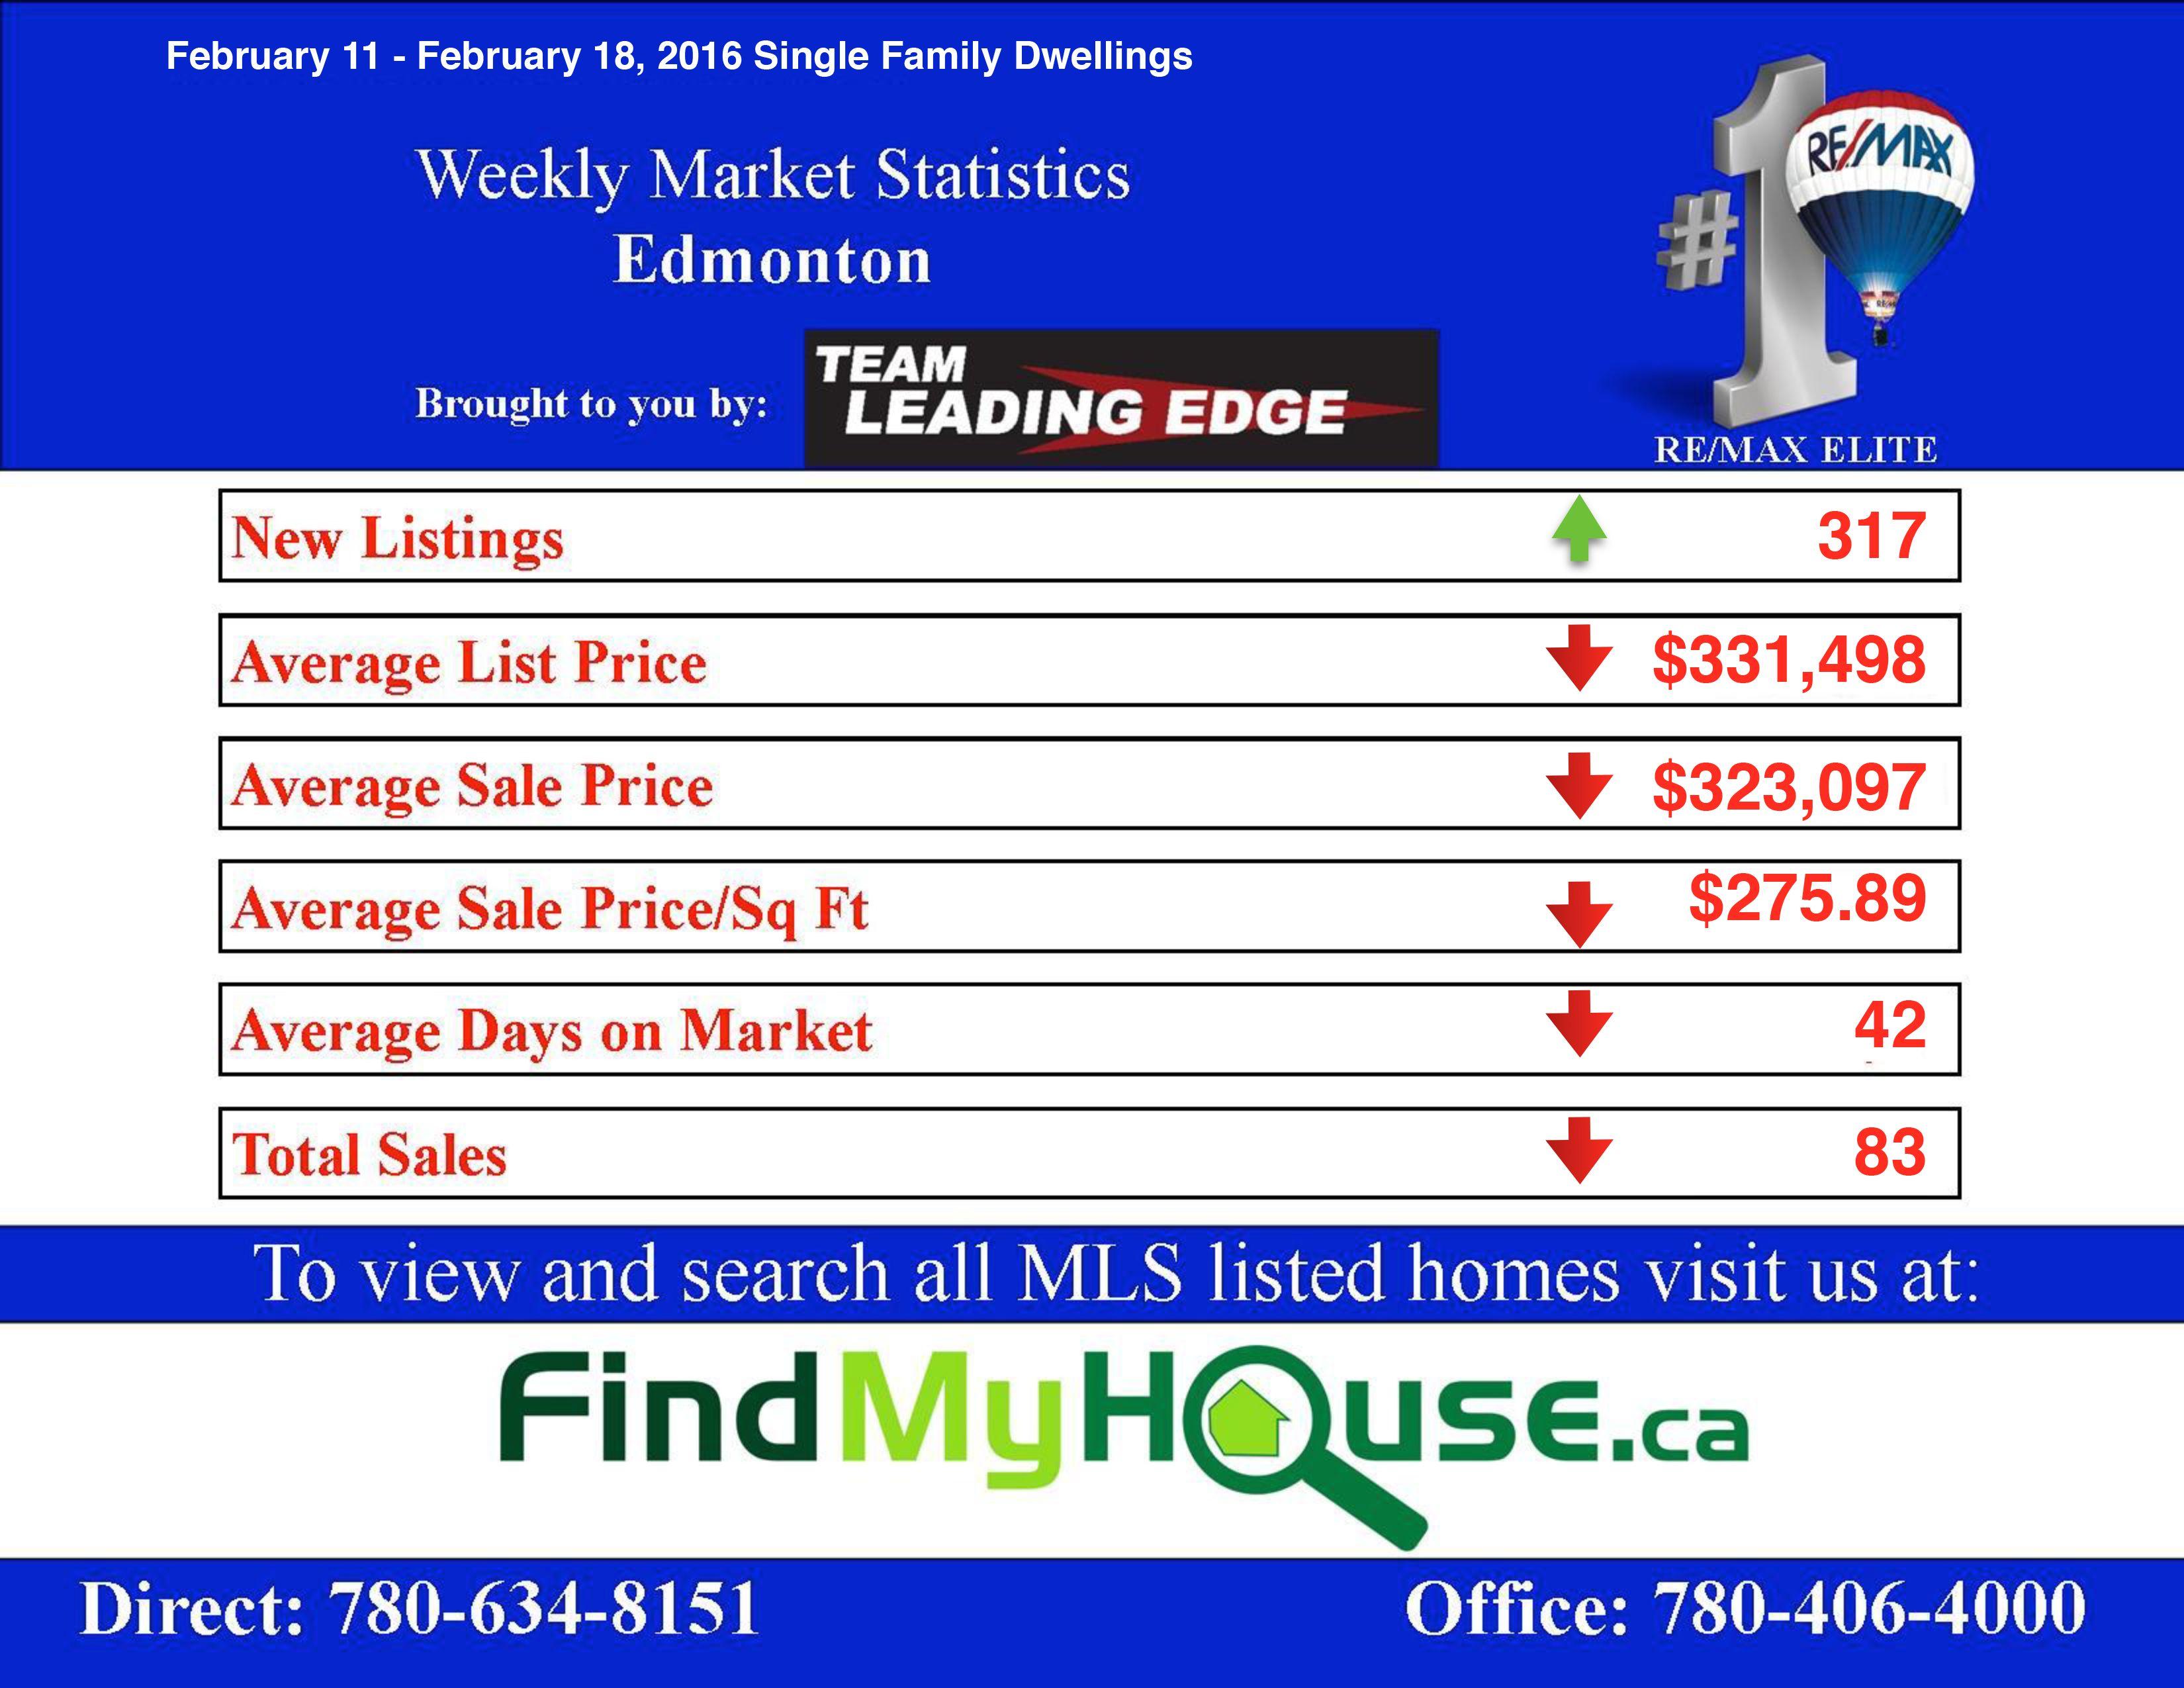 edmonton real estate market feb 11 - 18  2016